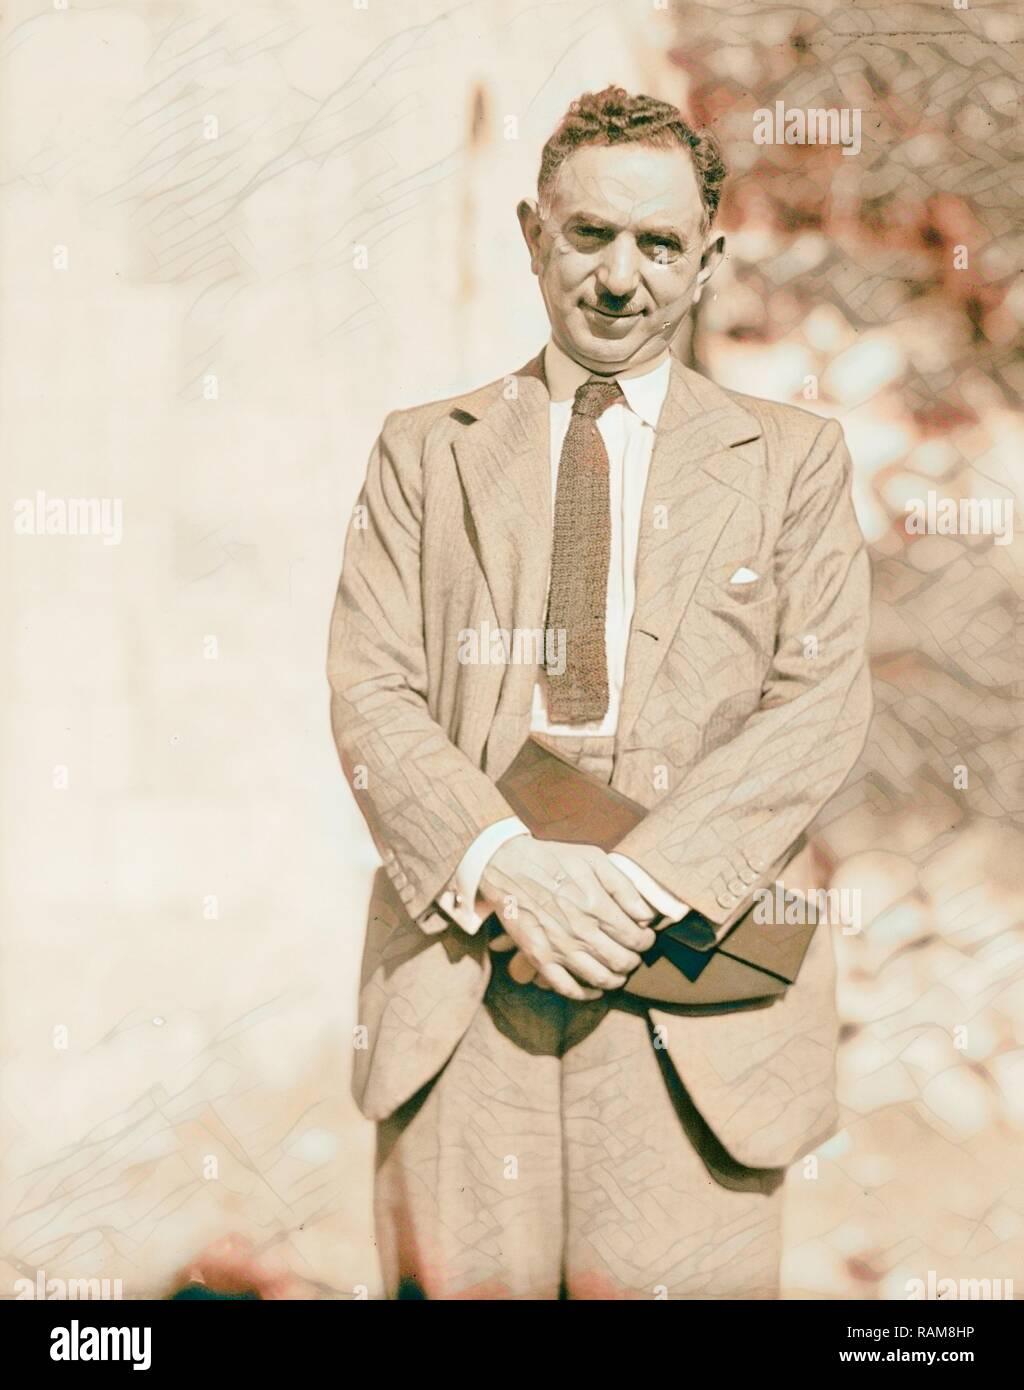 Palestine disturbances 1936. Nuri Pasha Es-Said, Foreign Minister of Iraq, arbitrator for the Palestine cause. 1936 reimagined Stock Photo